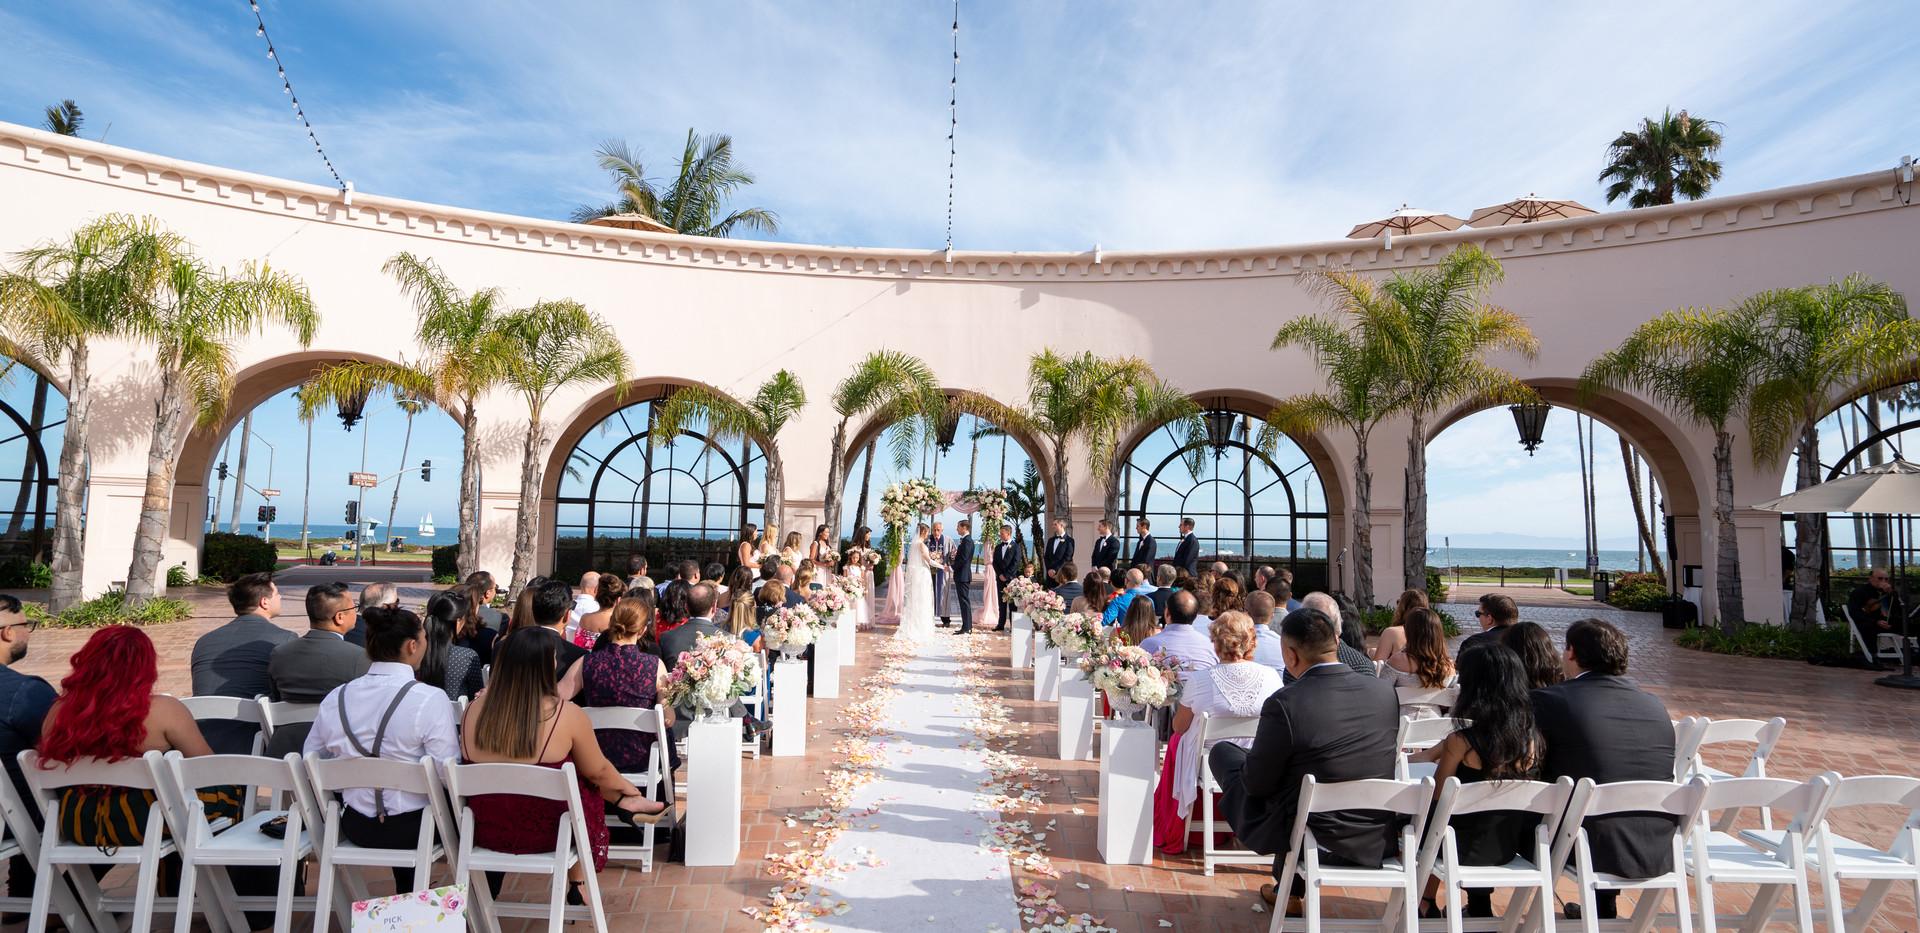 Hilton Santa Barbara Beach Front Resort Wedding Ceremony